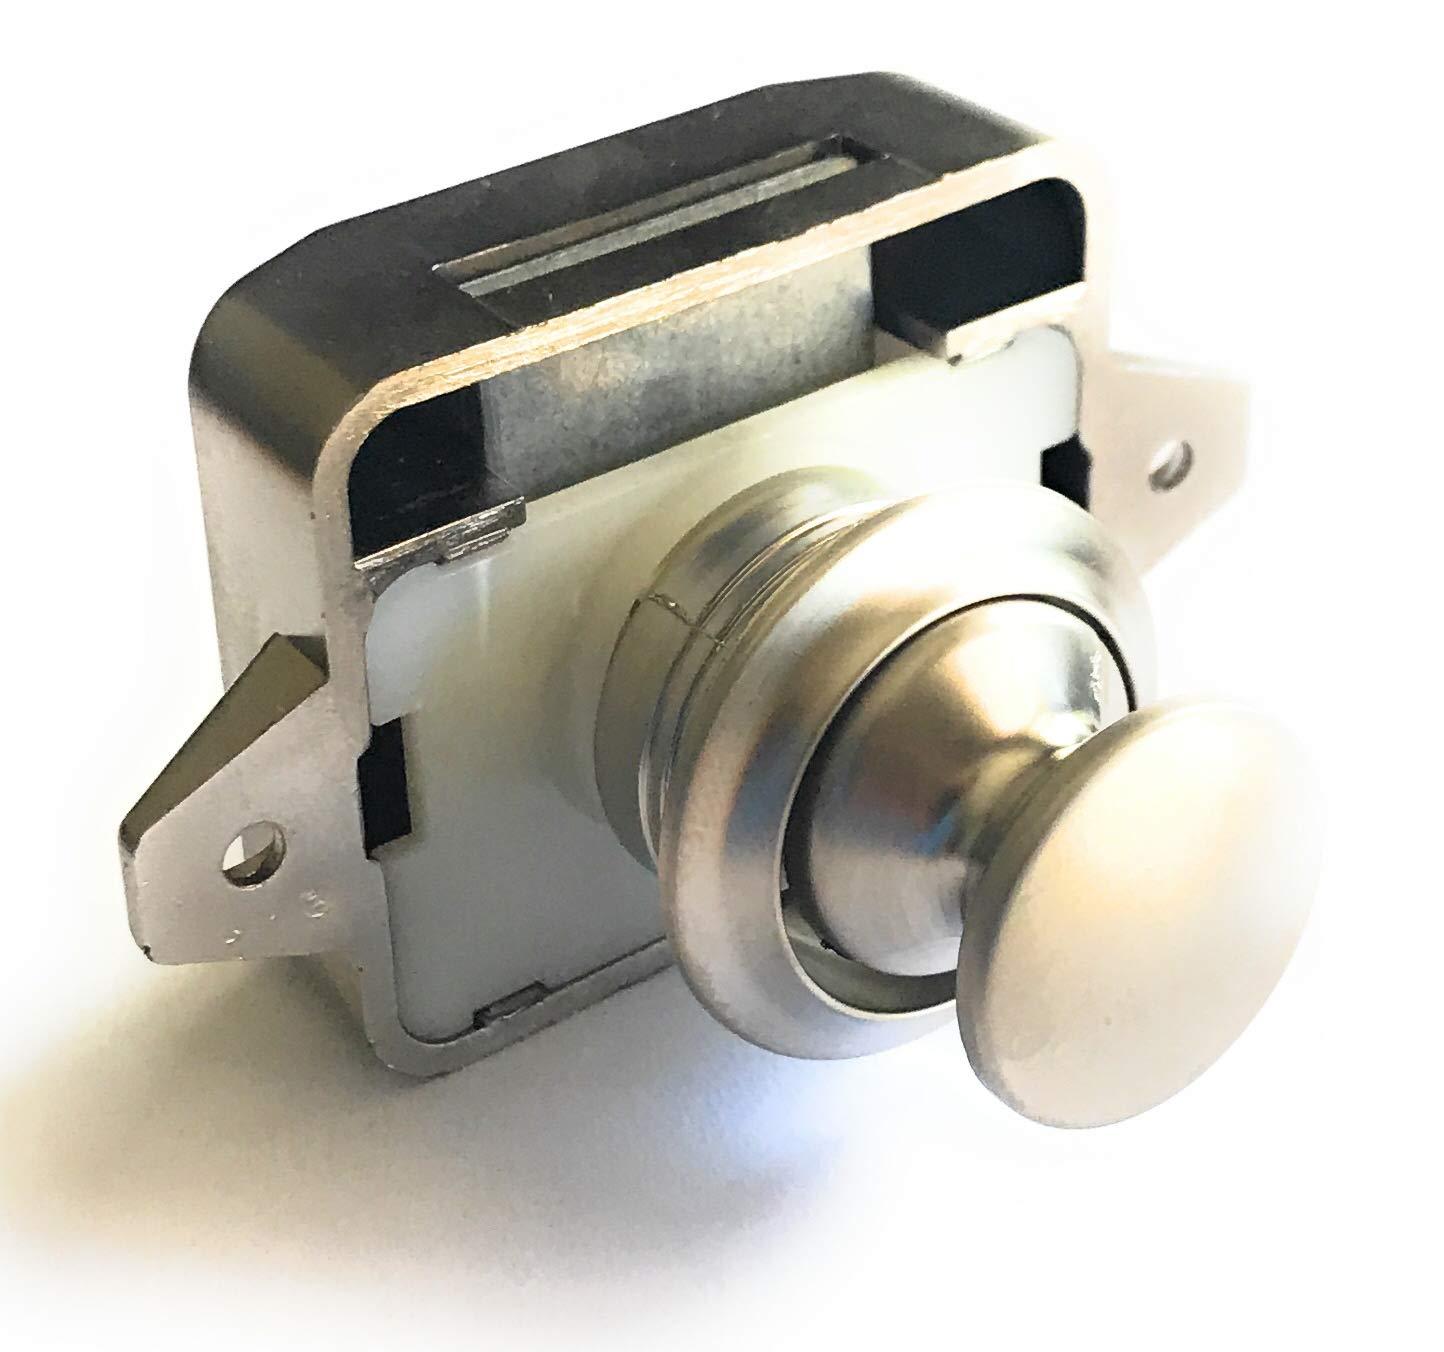 AMT Key Less Push Button Cabinet Latch for Rv/Motor Home Cupboard Caravan  Lock for Cupboard Push Latch Lock (Pearl Nickel)